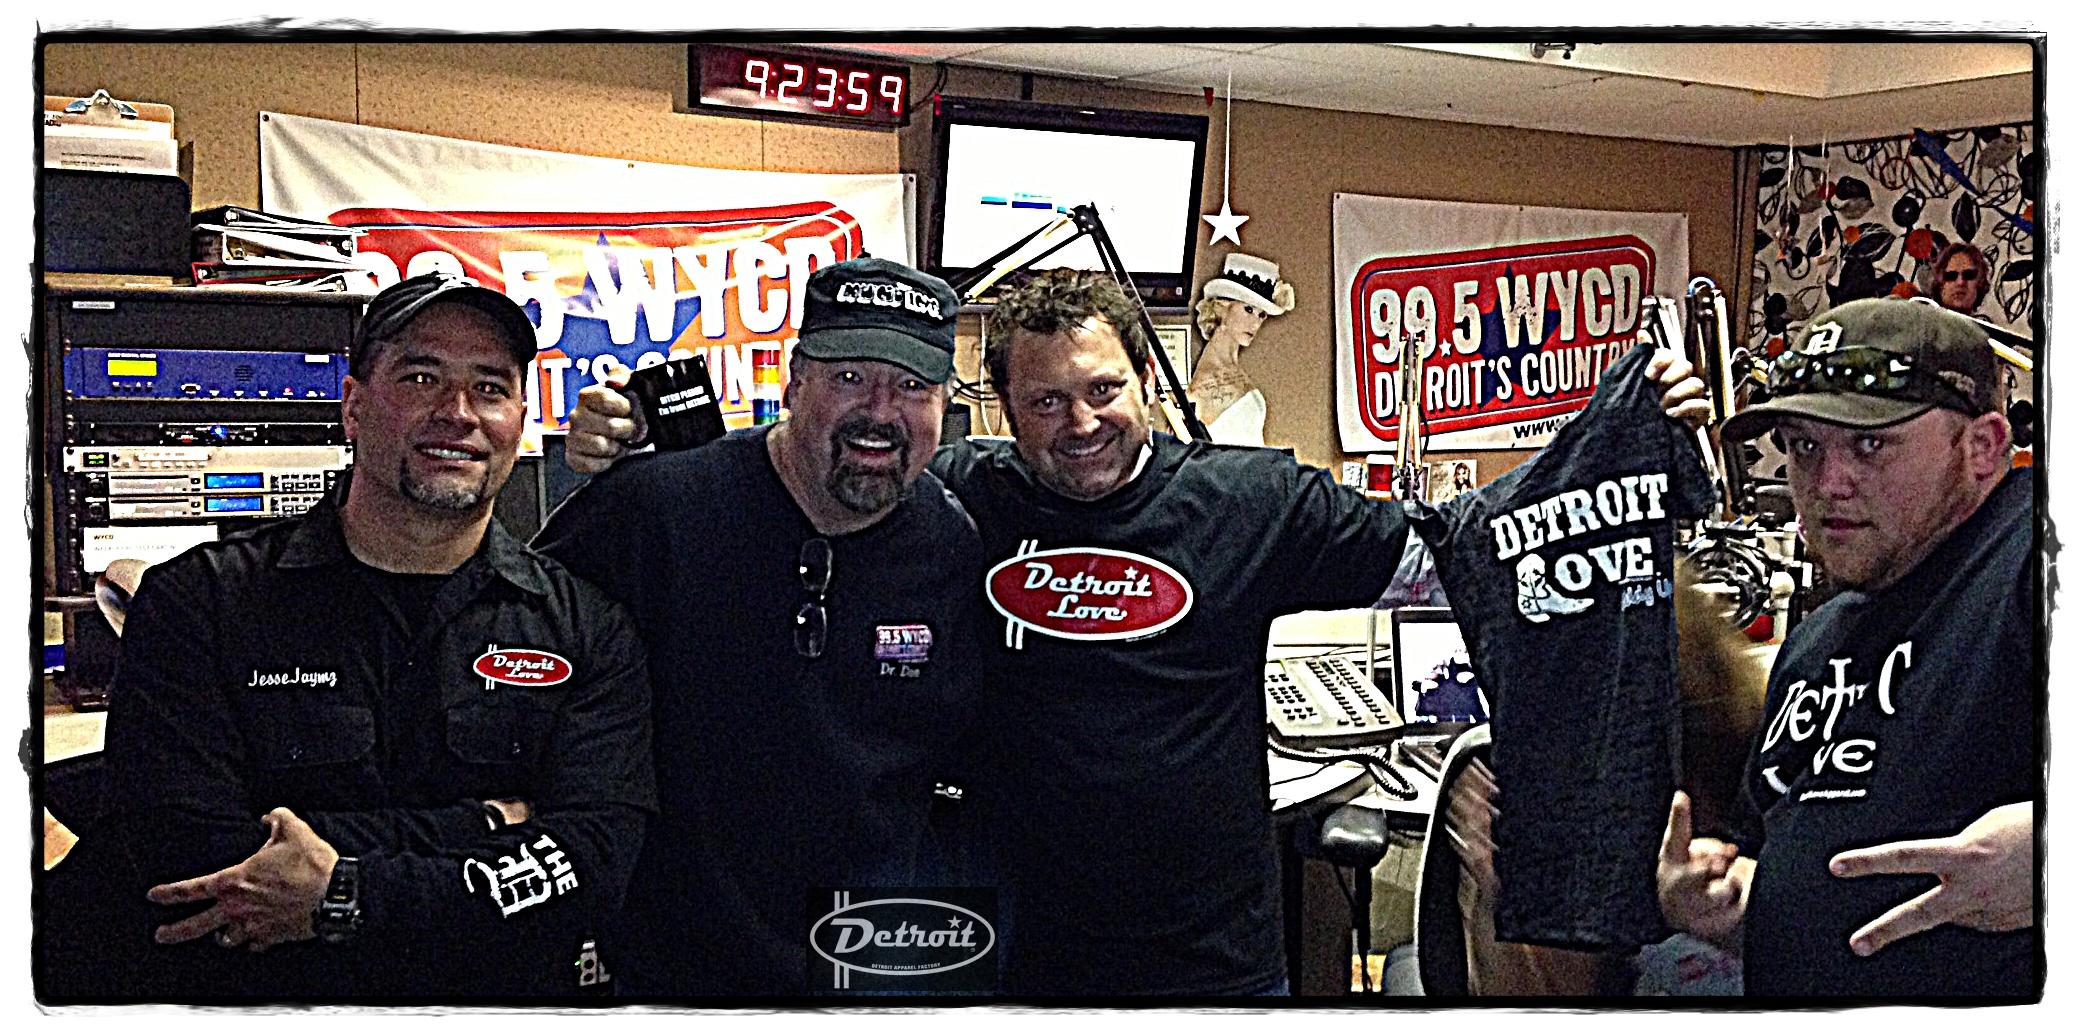 Dr. Don Radio Show, Steve Grunwald, Jason 300 -99.5 WYCD